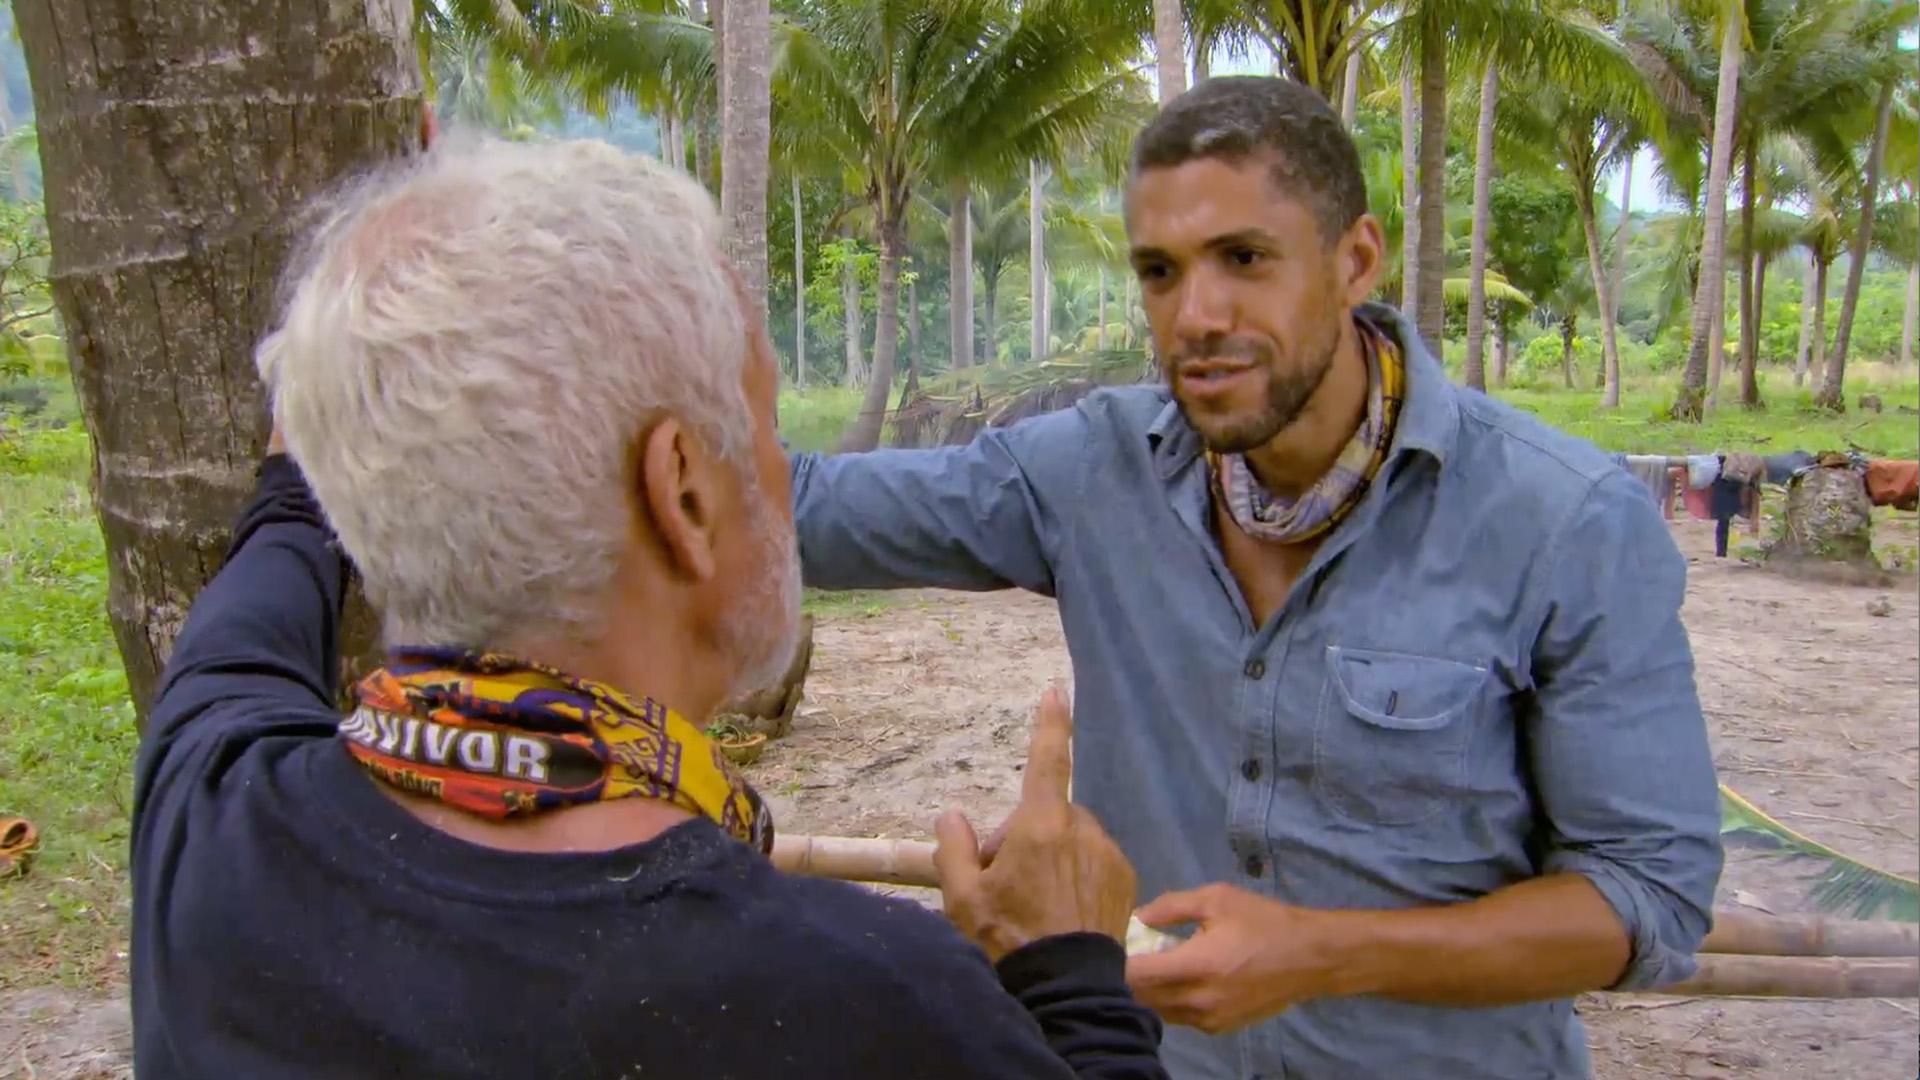 5. Joe puts Peter on the spot.